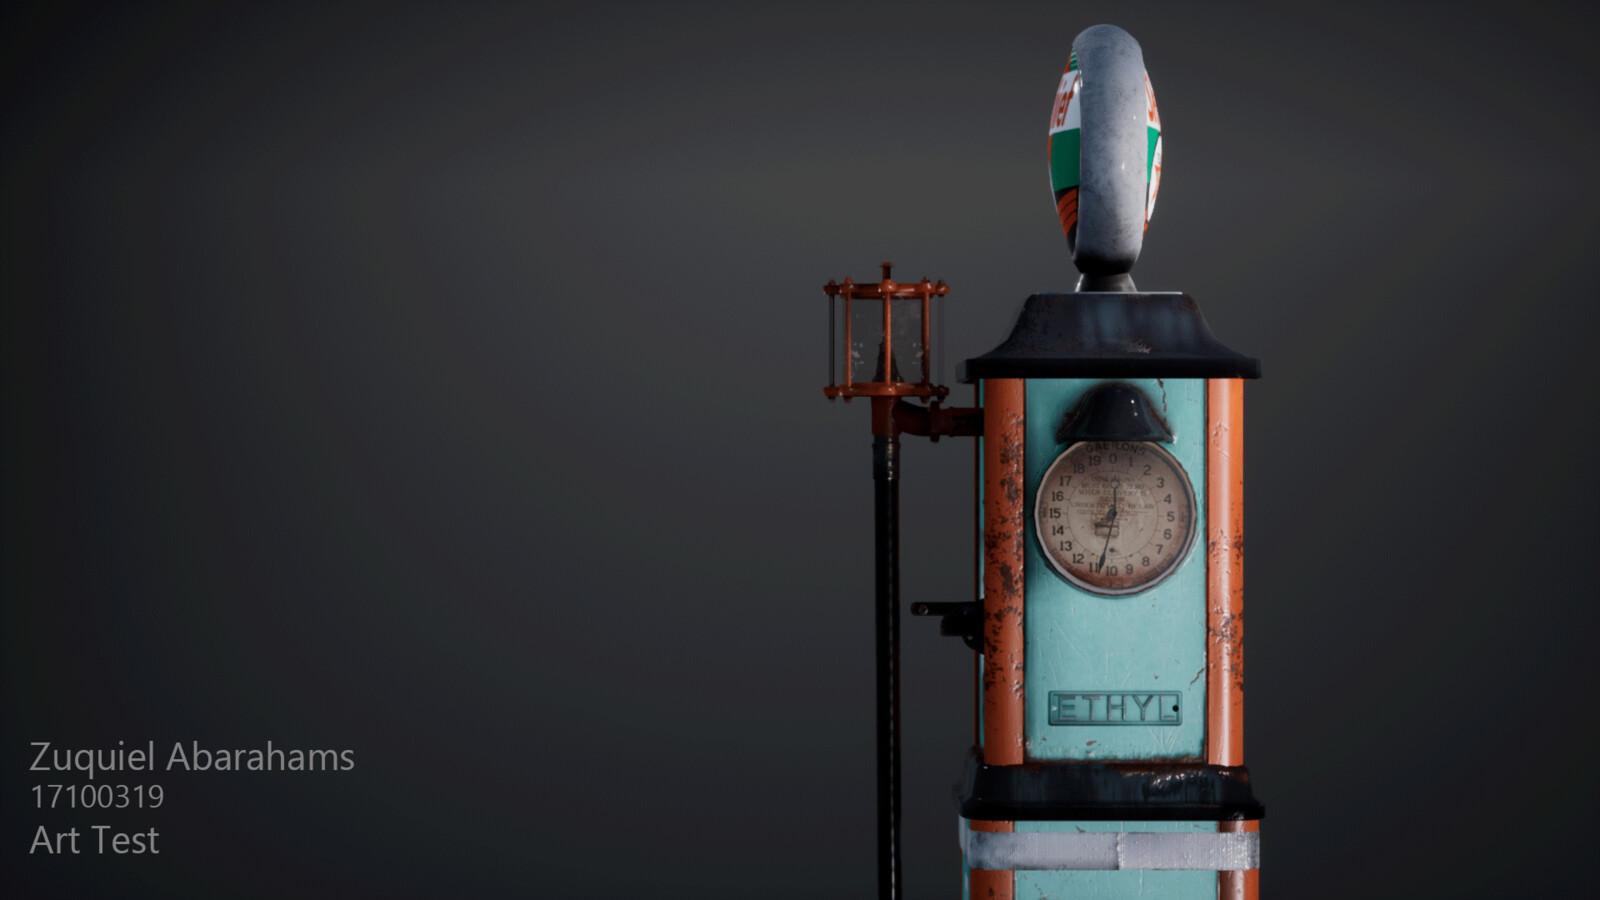 Sky Chief petrol pump